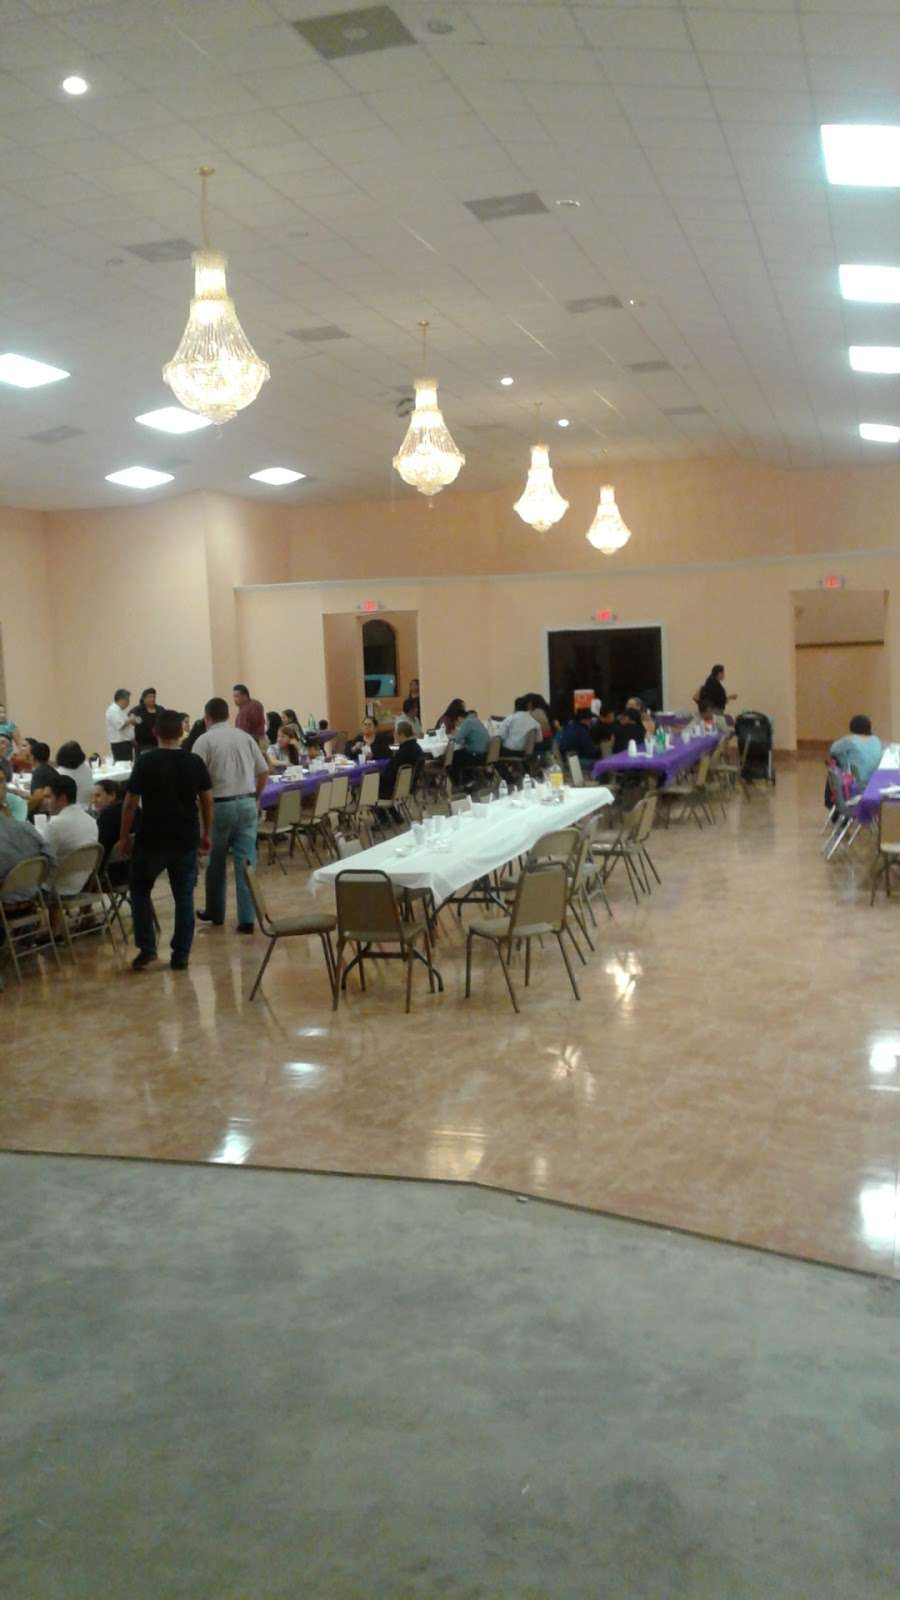 Iglesia De Dios Fuente De Vida - church  | Photo 2 of 10 | Address: 3125 Frick Rd, Houston, TX 77038, USA | Phone: (713) 498-0609